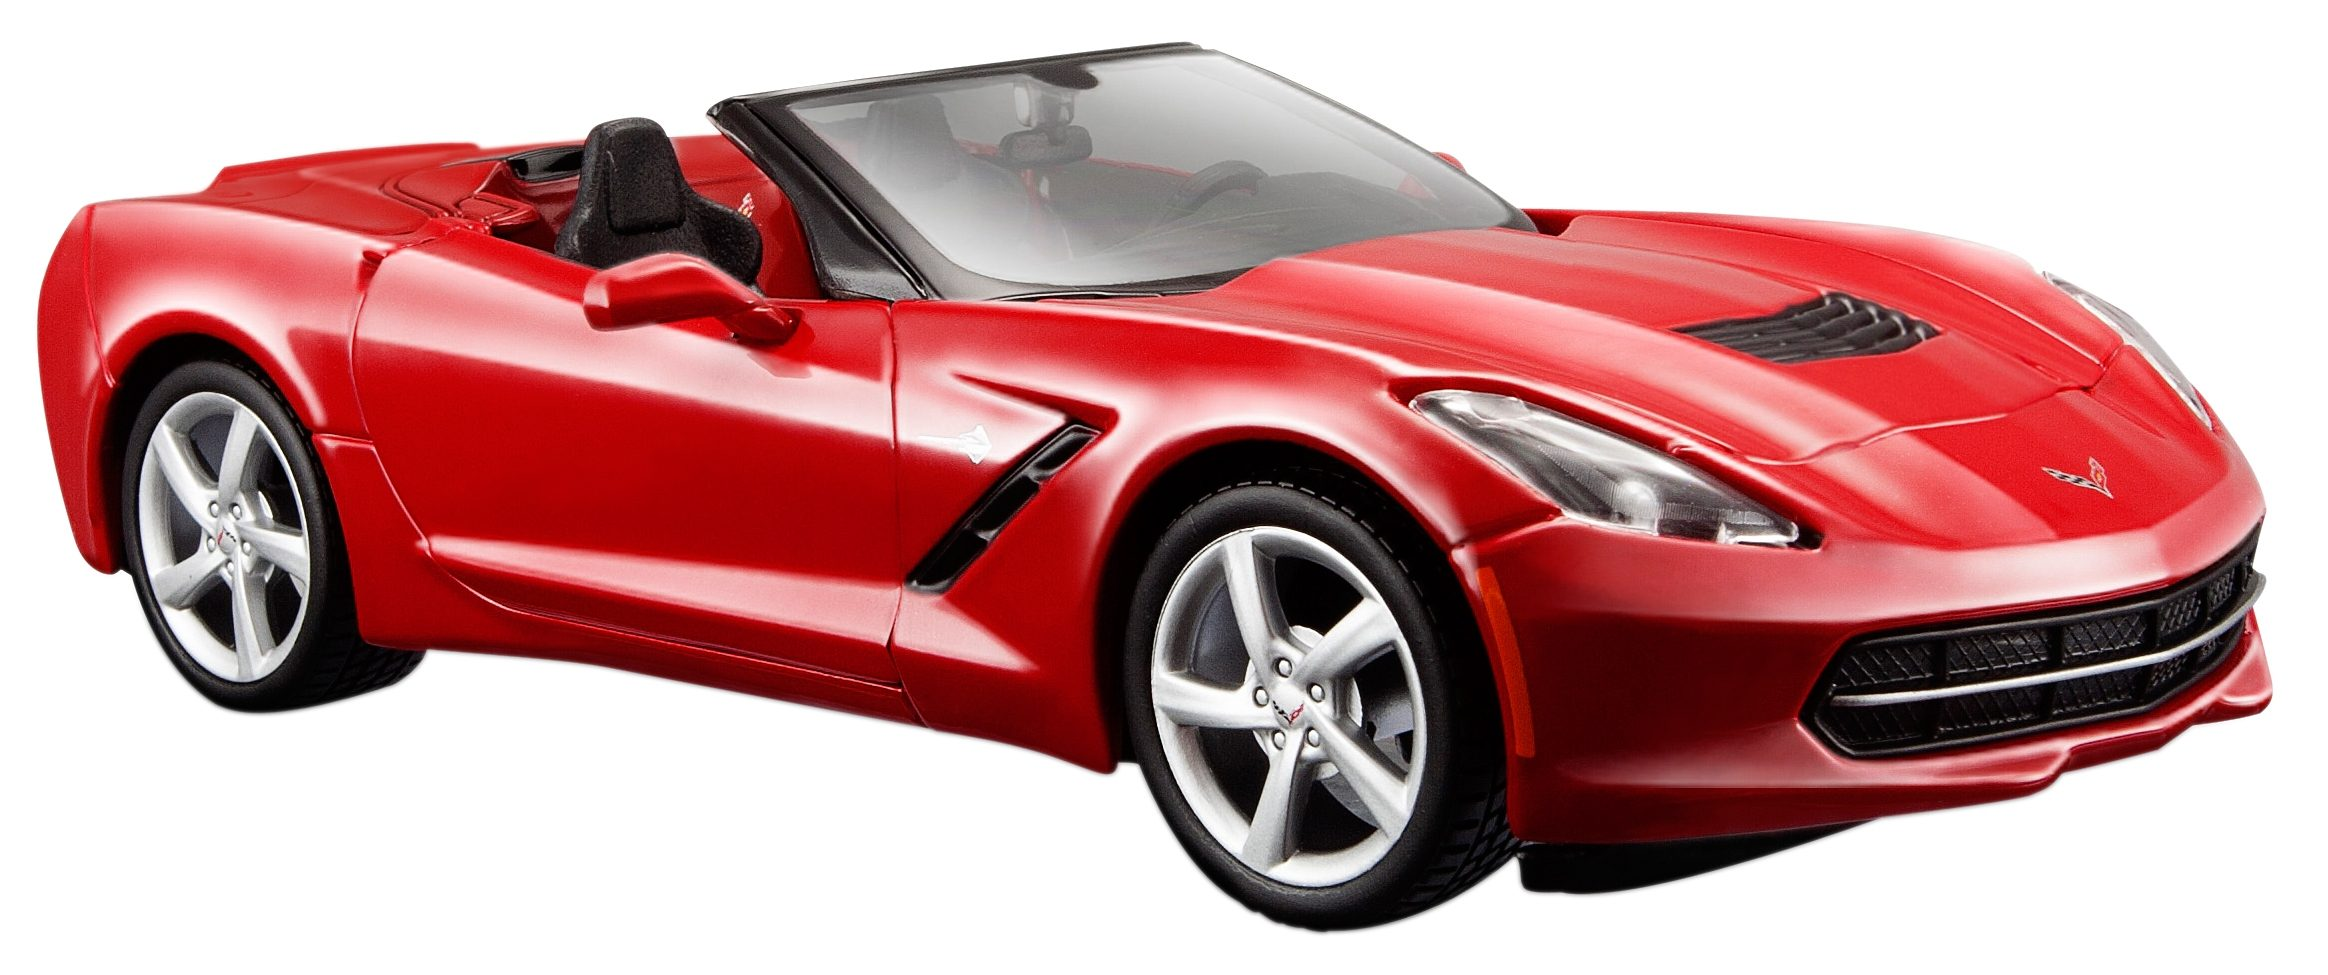 Maisto® Sammlerauto, 1:24, »Corvette Stingray Cabrio«